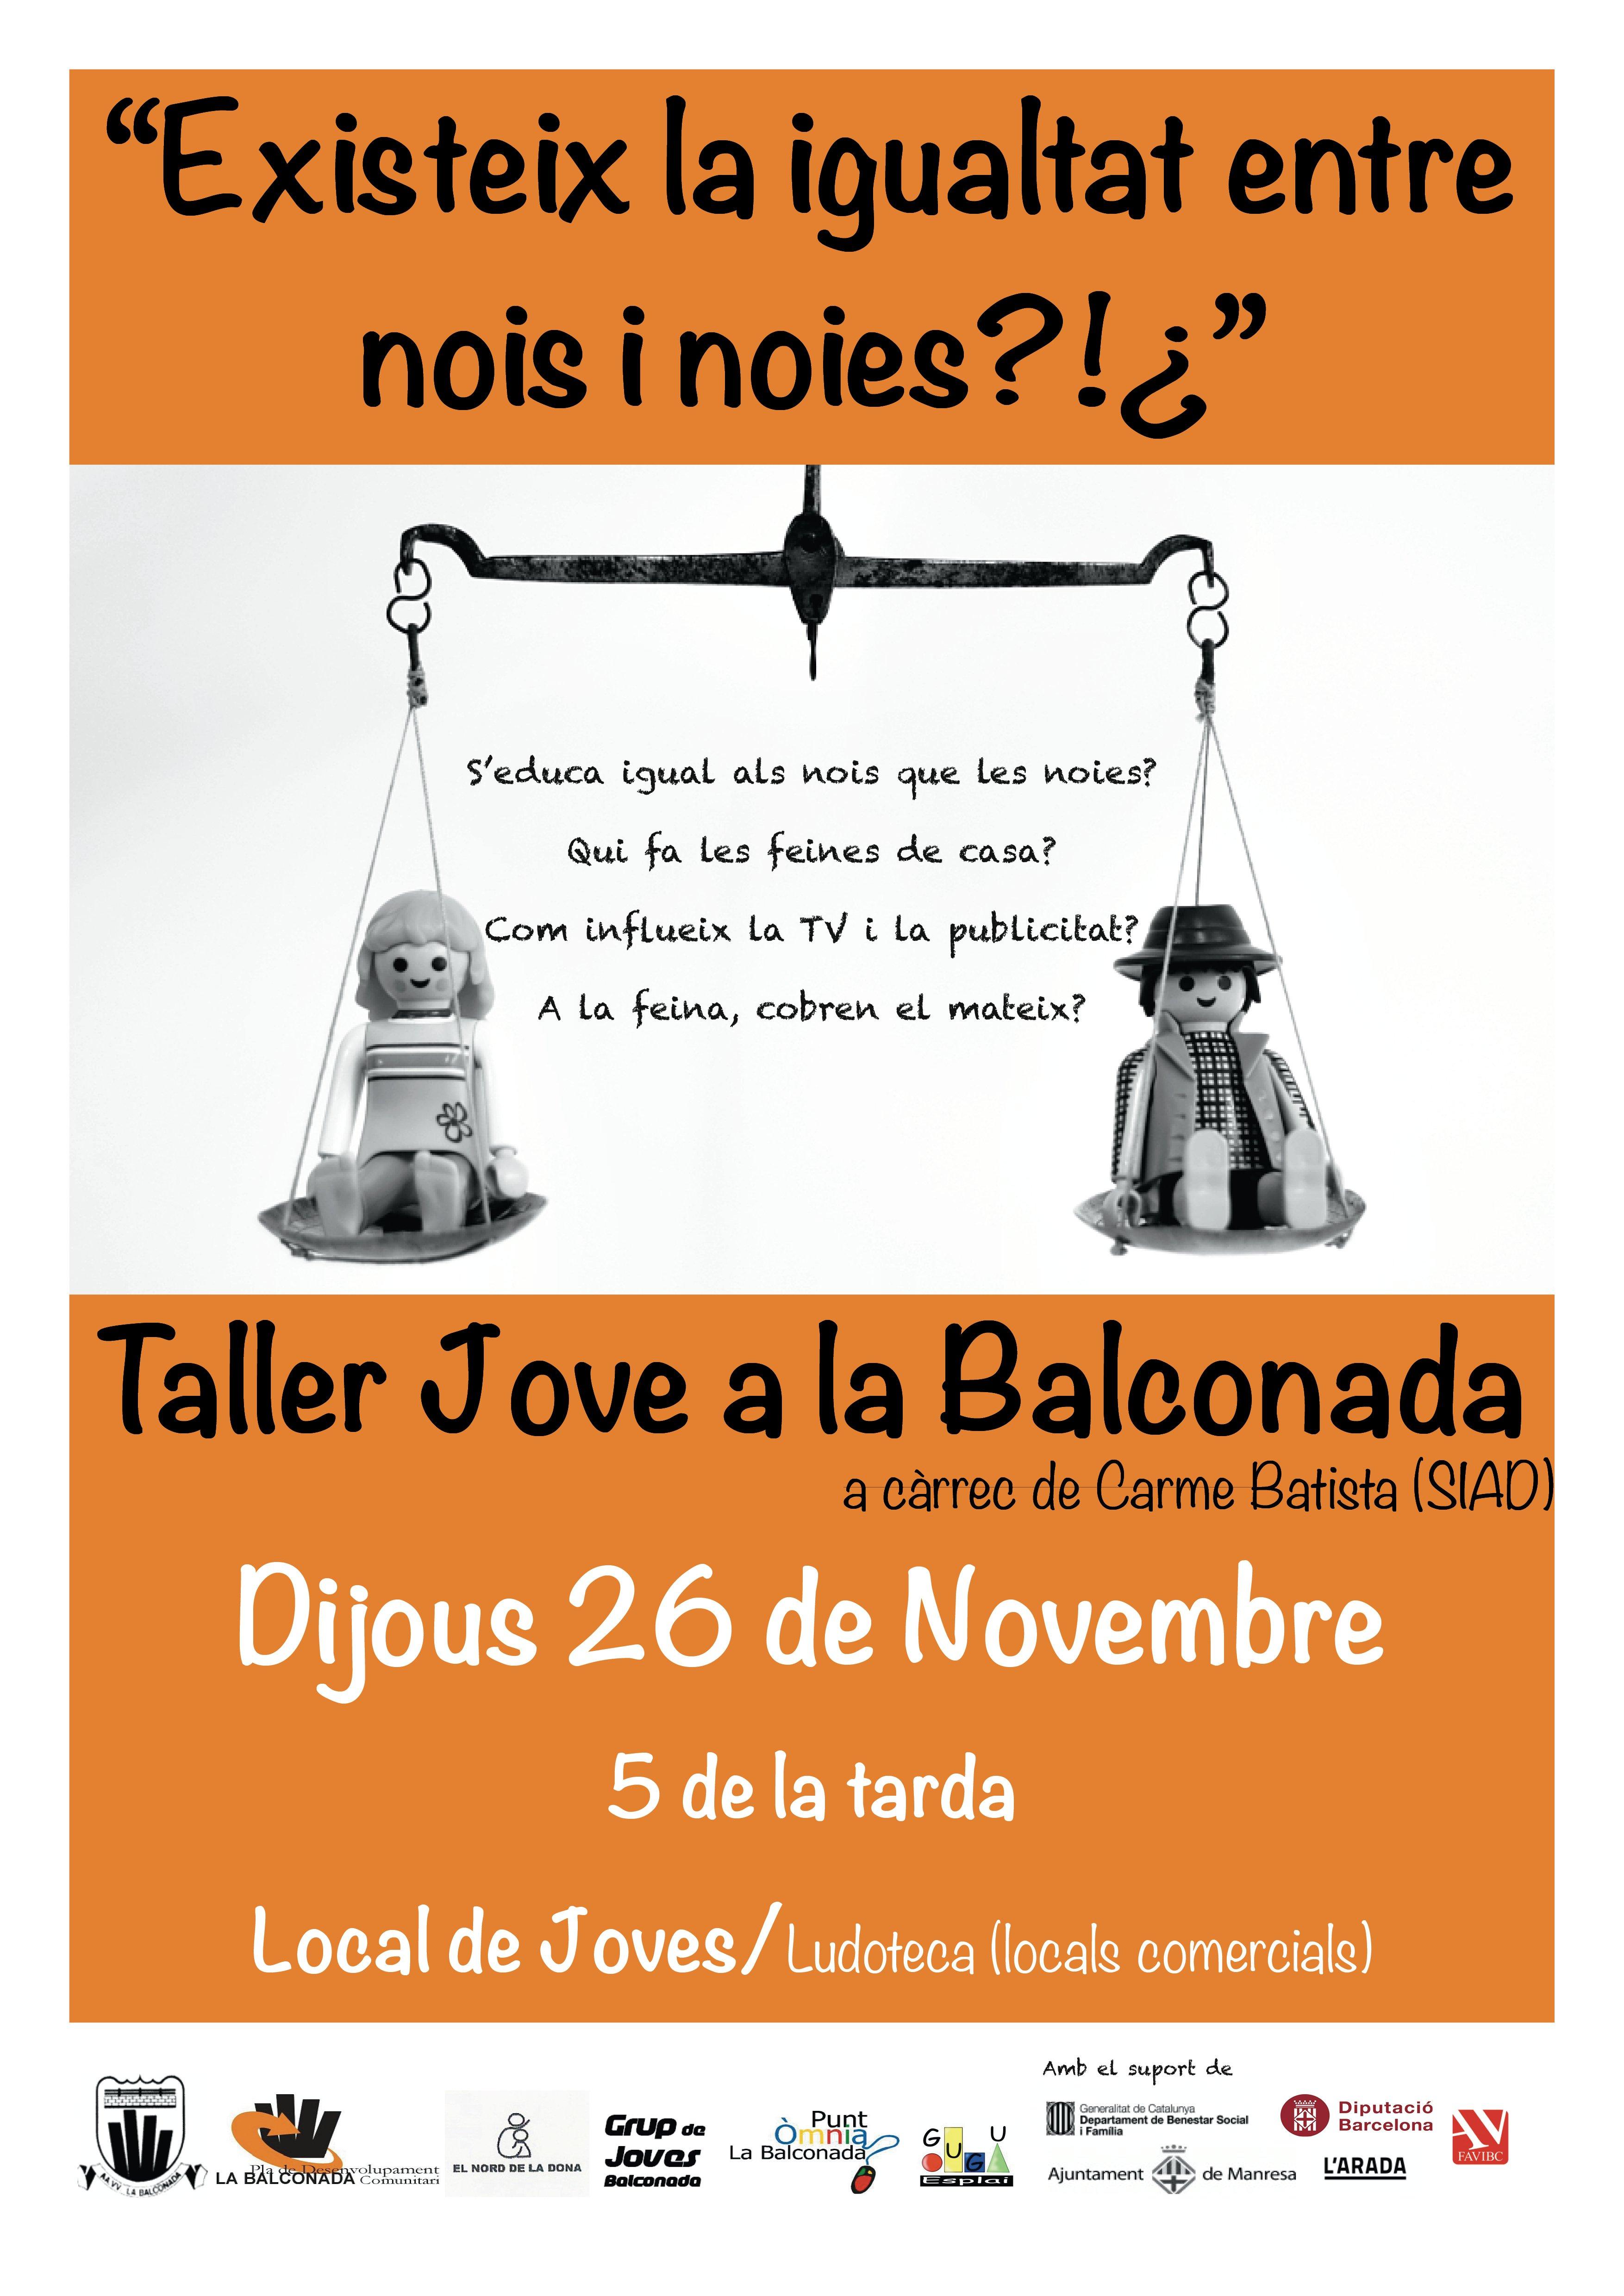 Taller jove igualtat de gènere Balconada 2015.